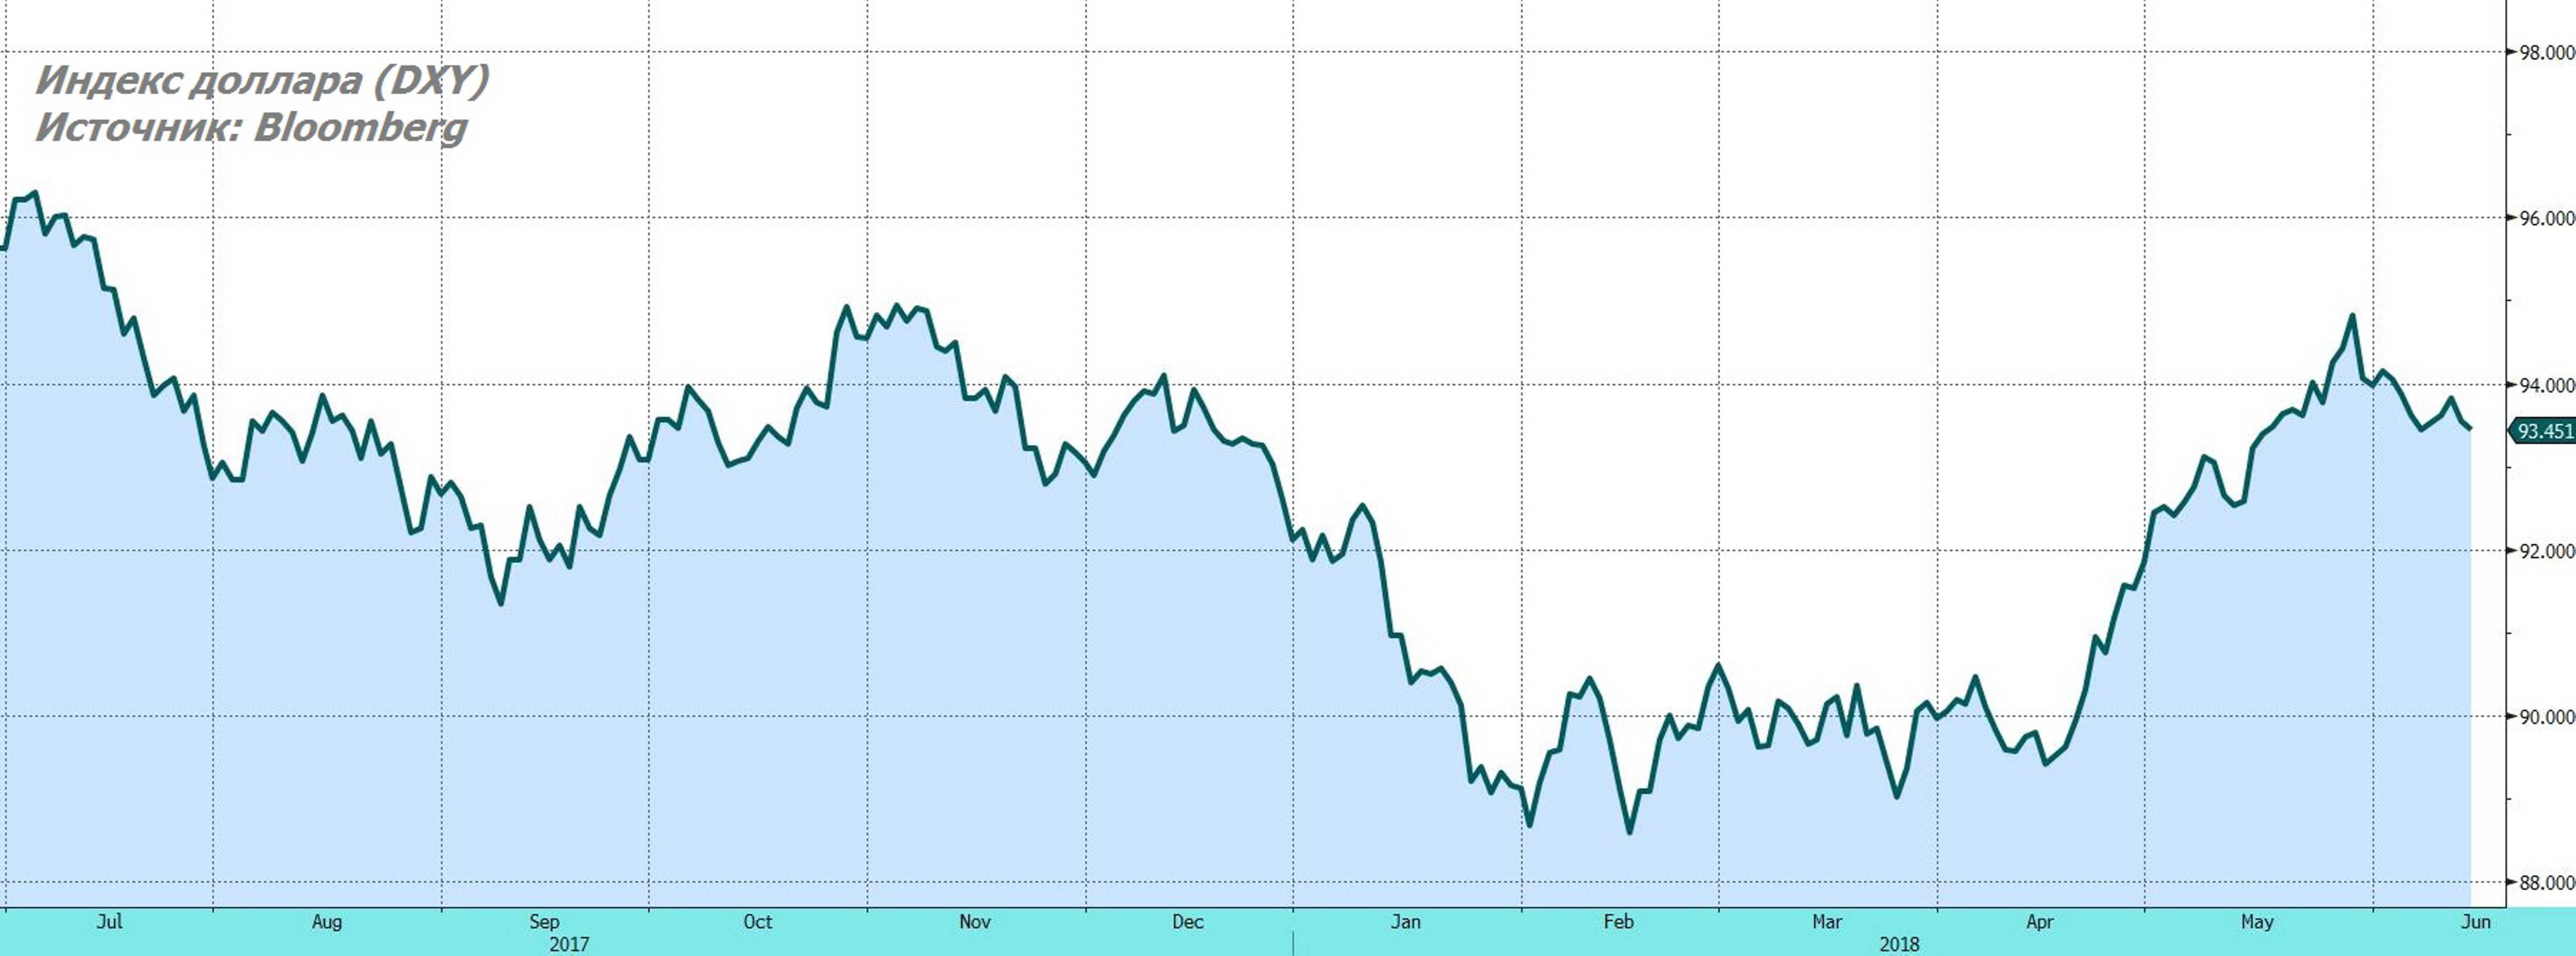 Монетарная политика США охлаждает рынки акций